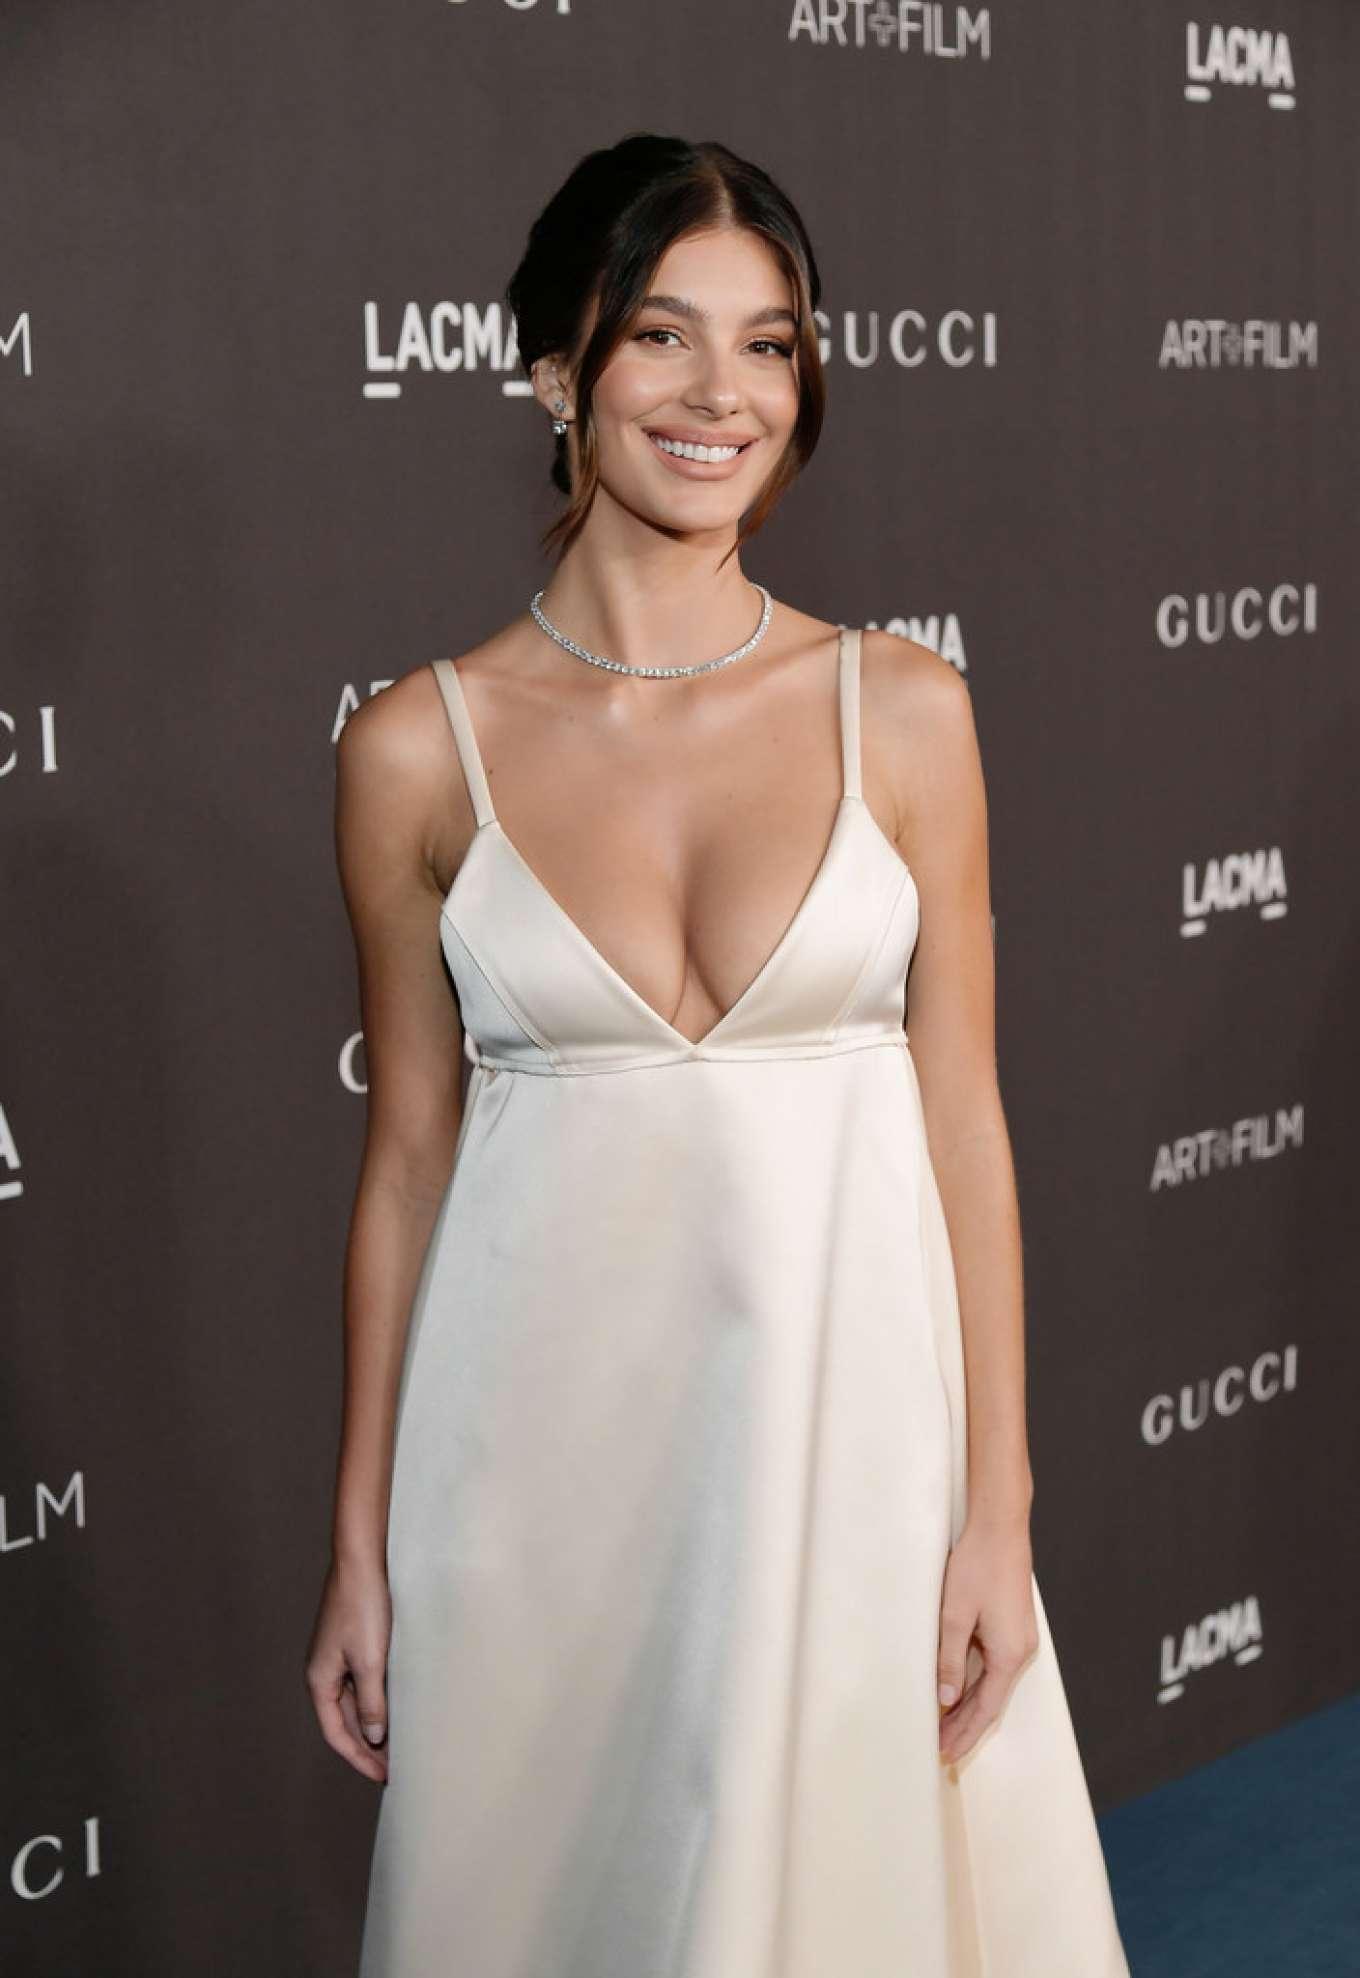 Camila Morrone - LACMA Art and Film Gala 2019 in Los Angeles